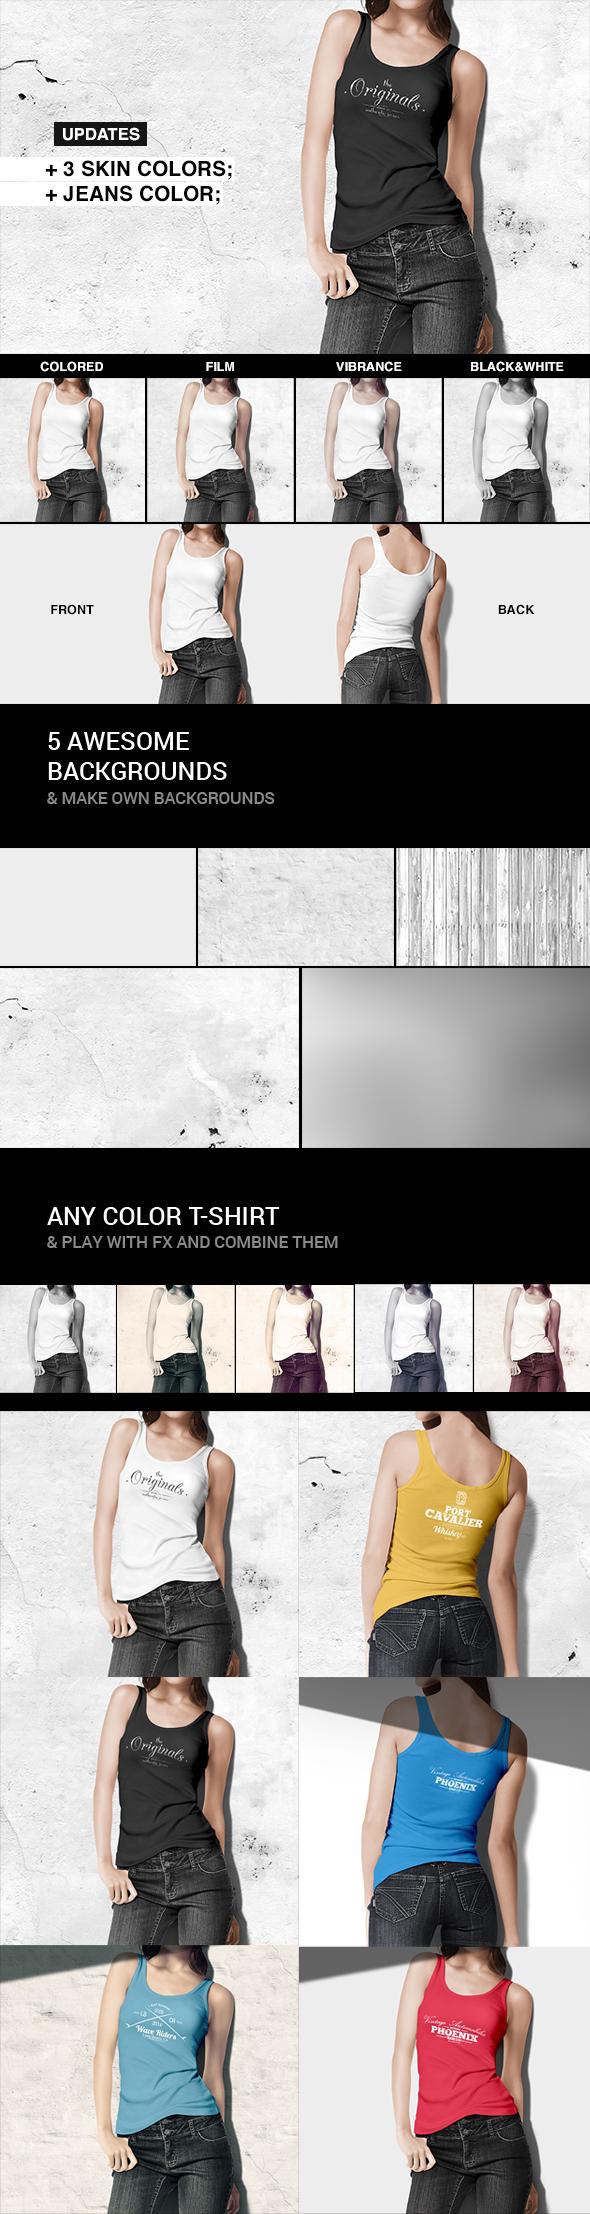 T-shirt / Tank Shirt Bundle Mockup Template